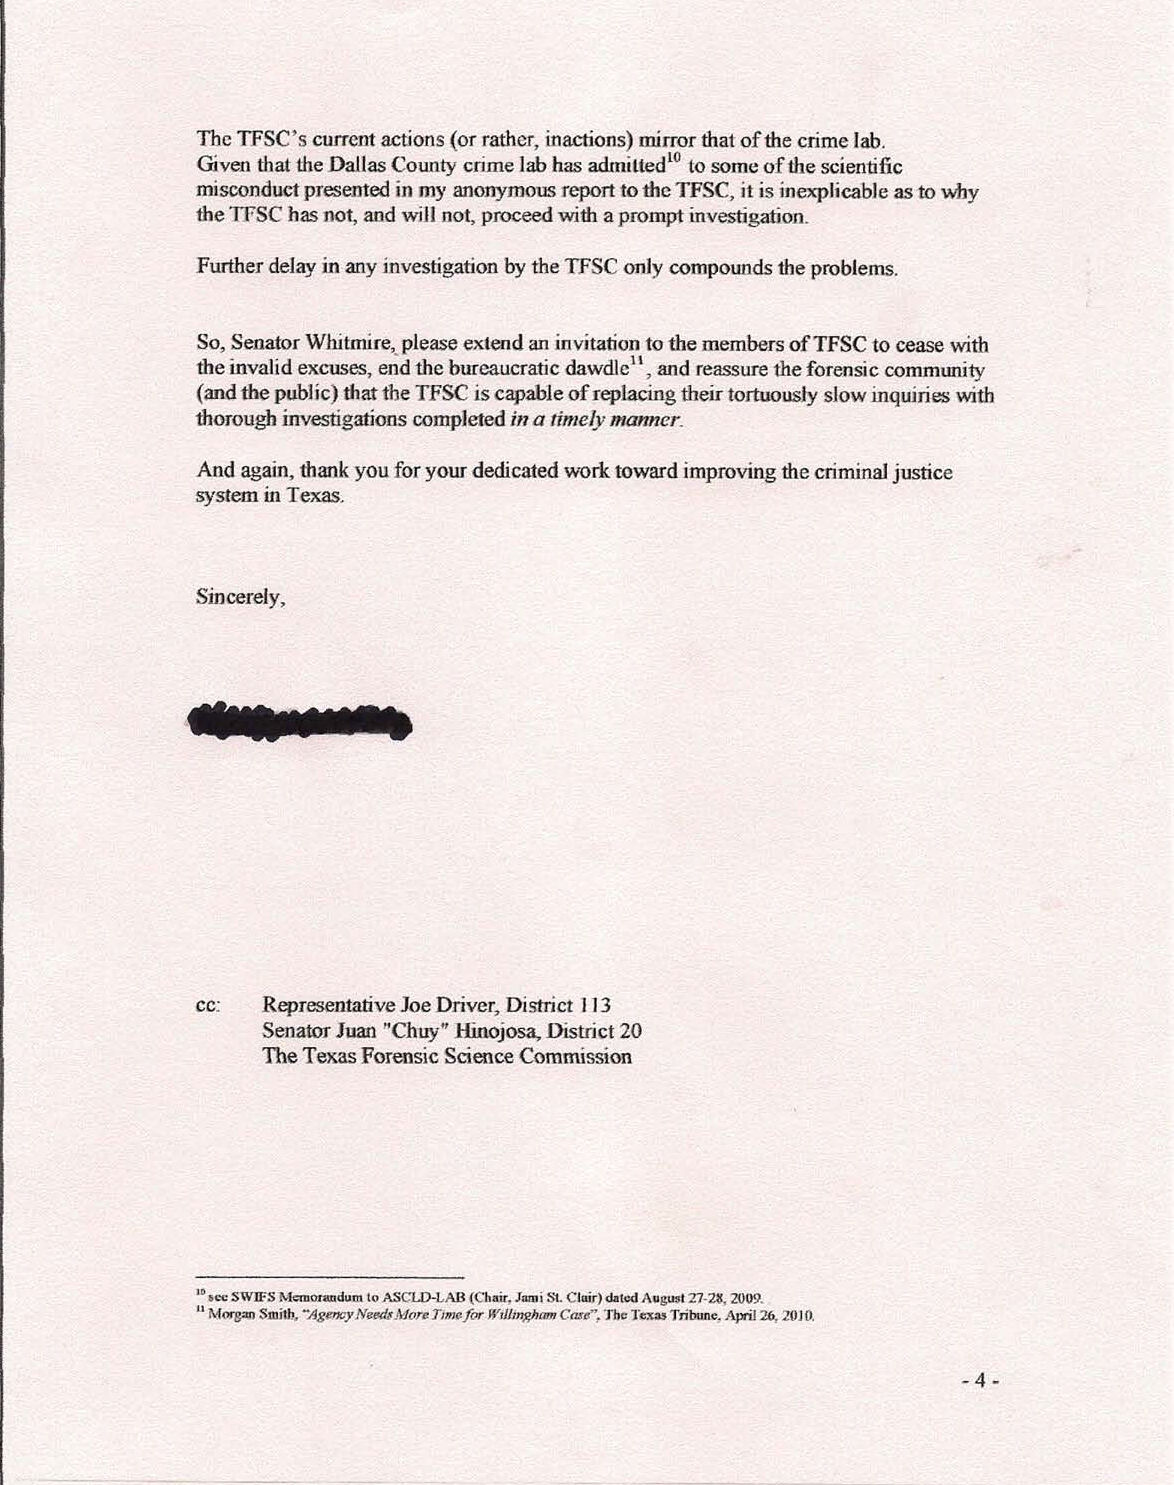 Letter of Disagreement – Disagreement Letter